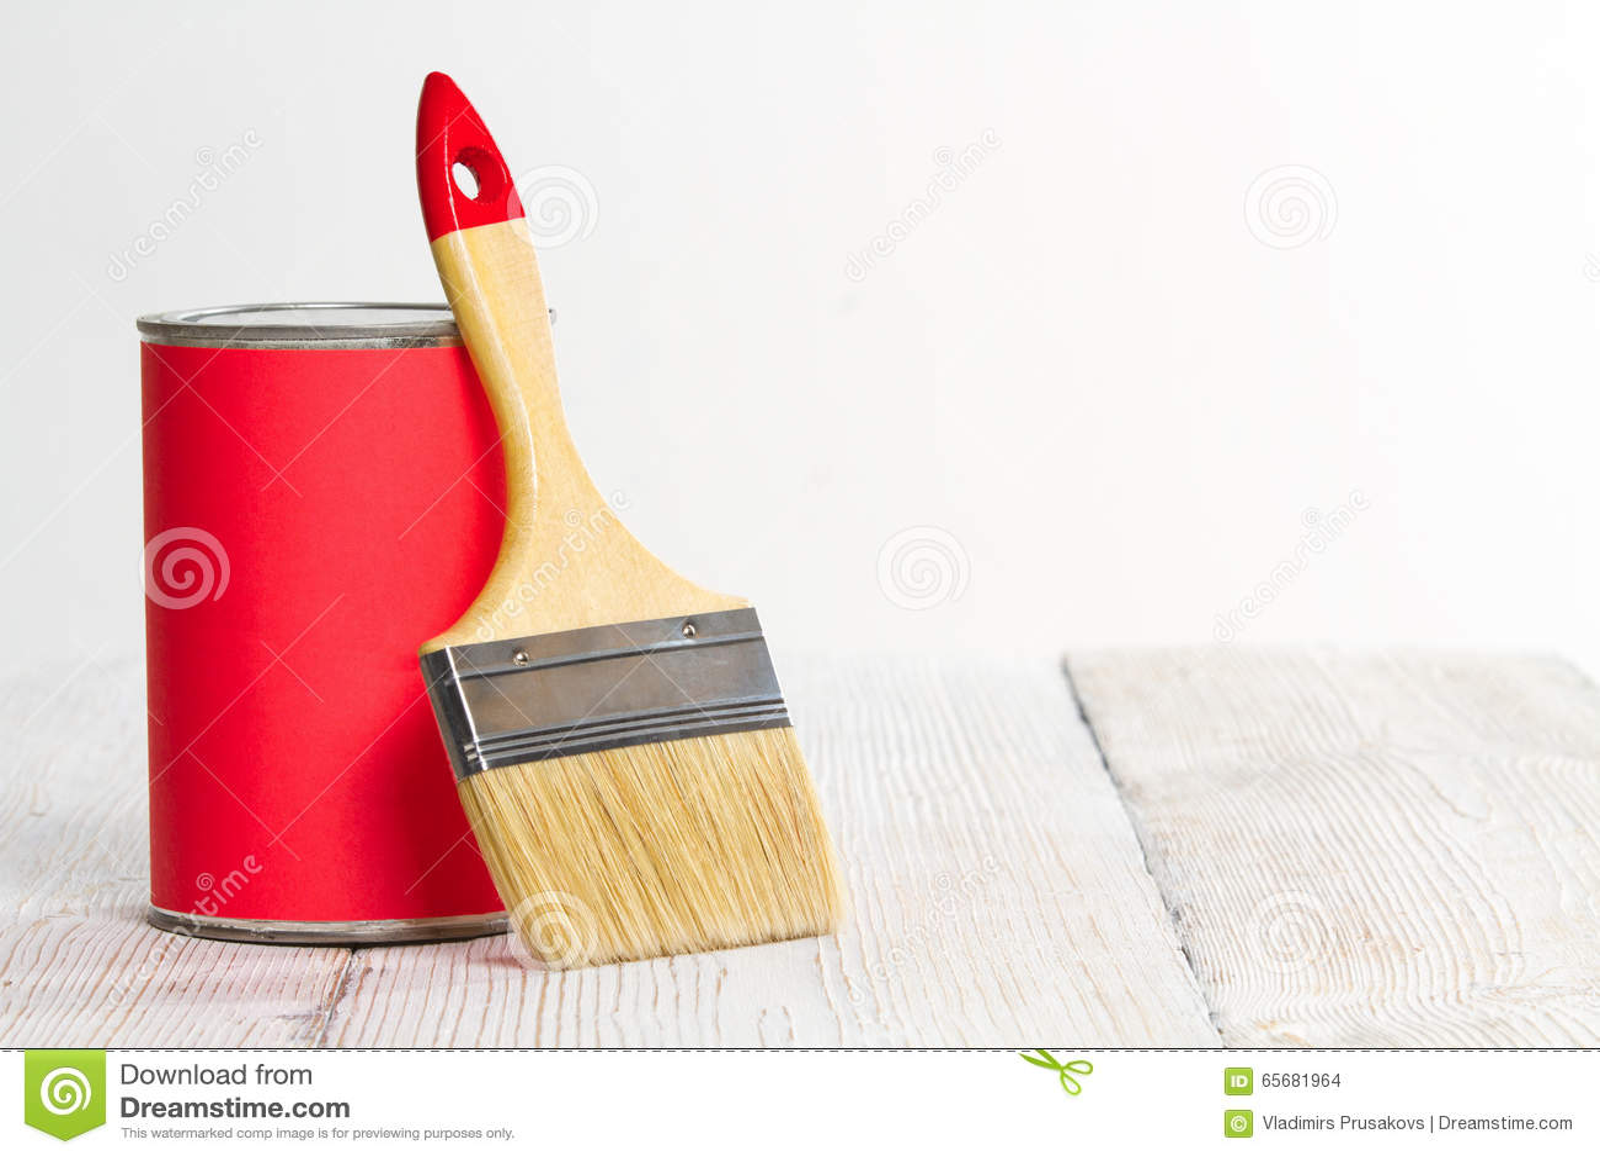 Holzfußboden Lackieren ~ Farbe kann bürsten lackieren holzfußboden weiße wand stockfoto